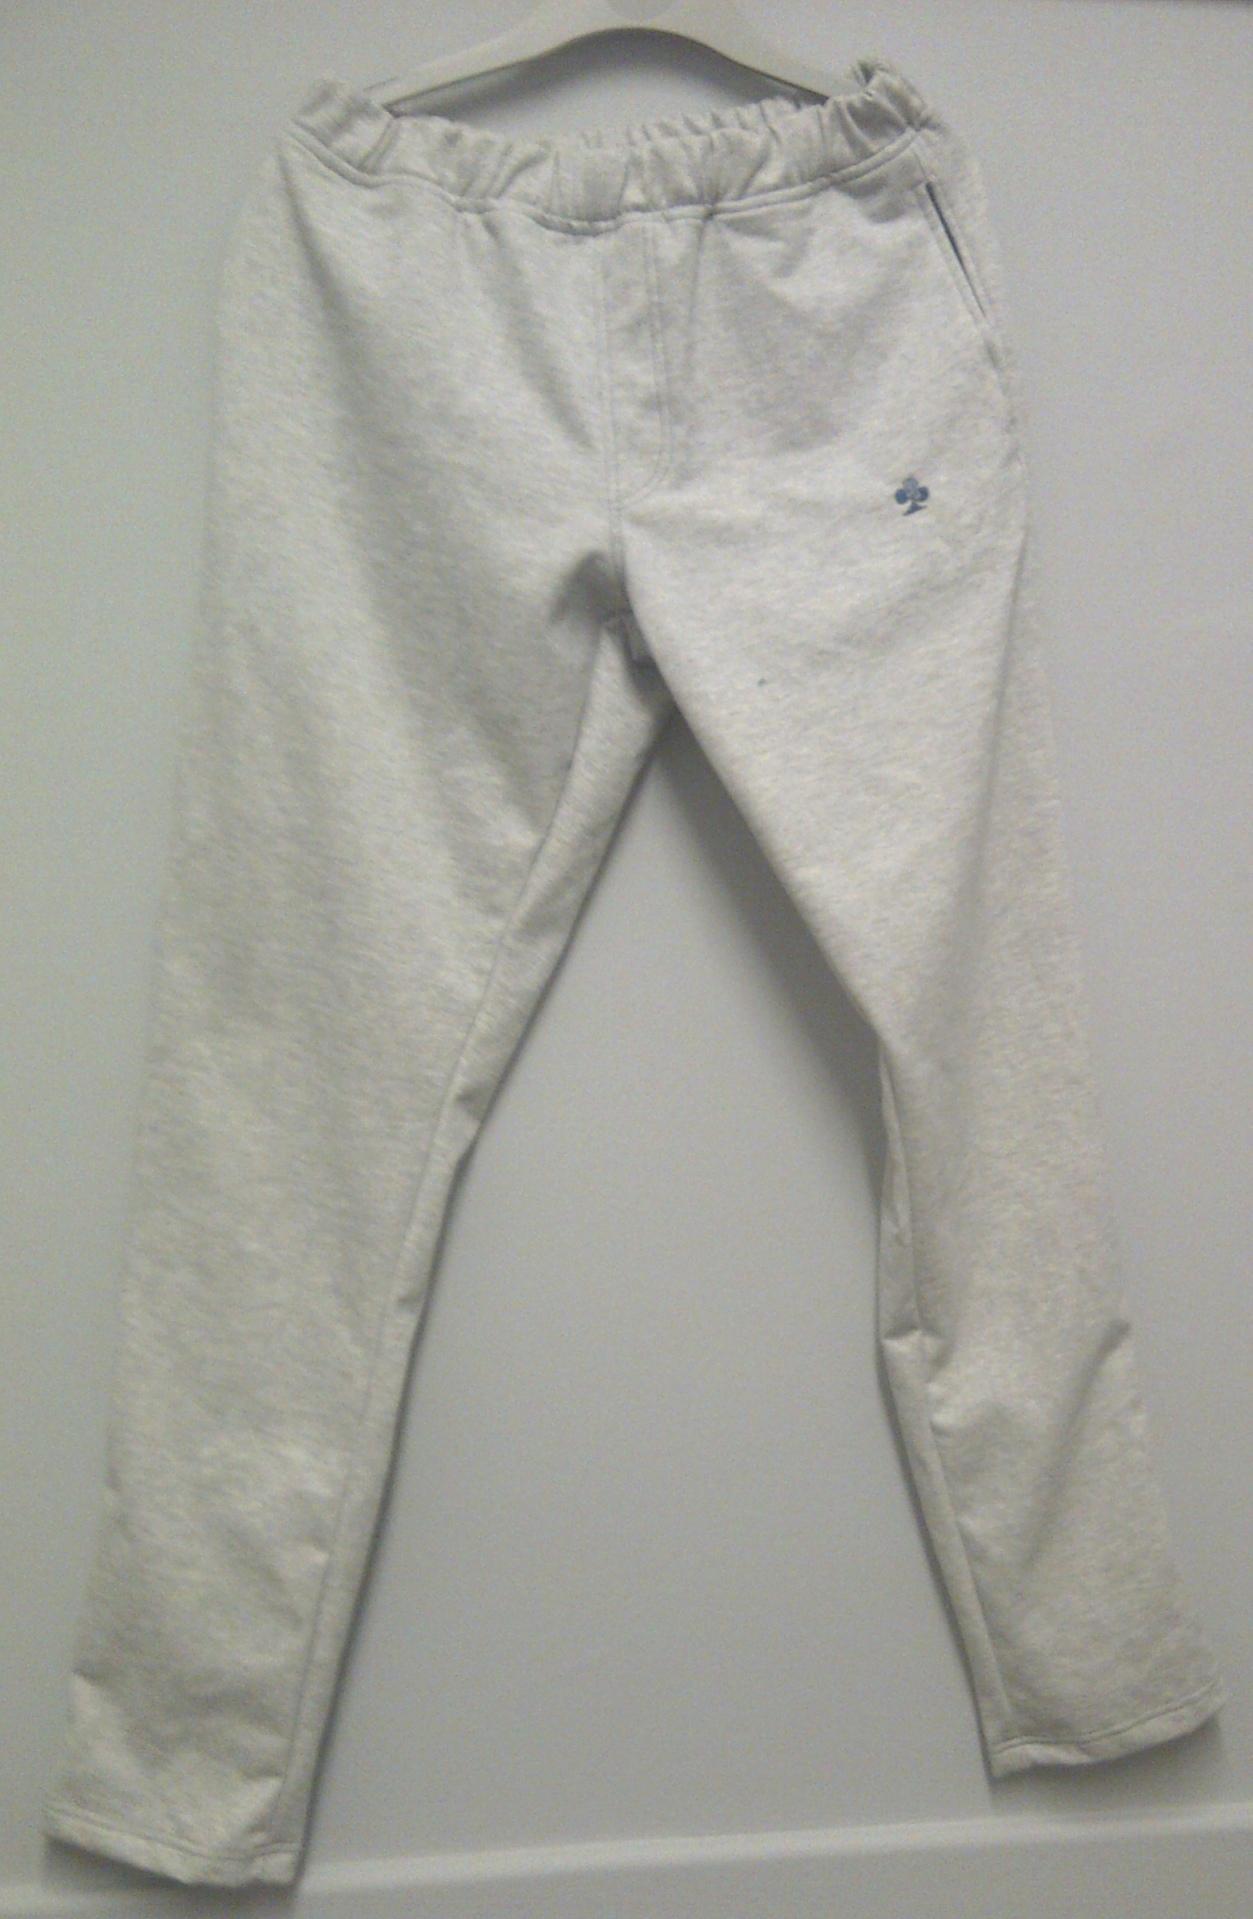 4d5b32029f02 Cloudnine Urbanwear Greymel track pants